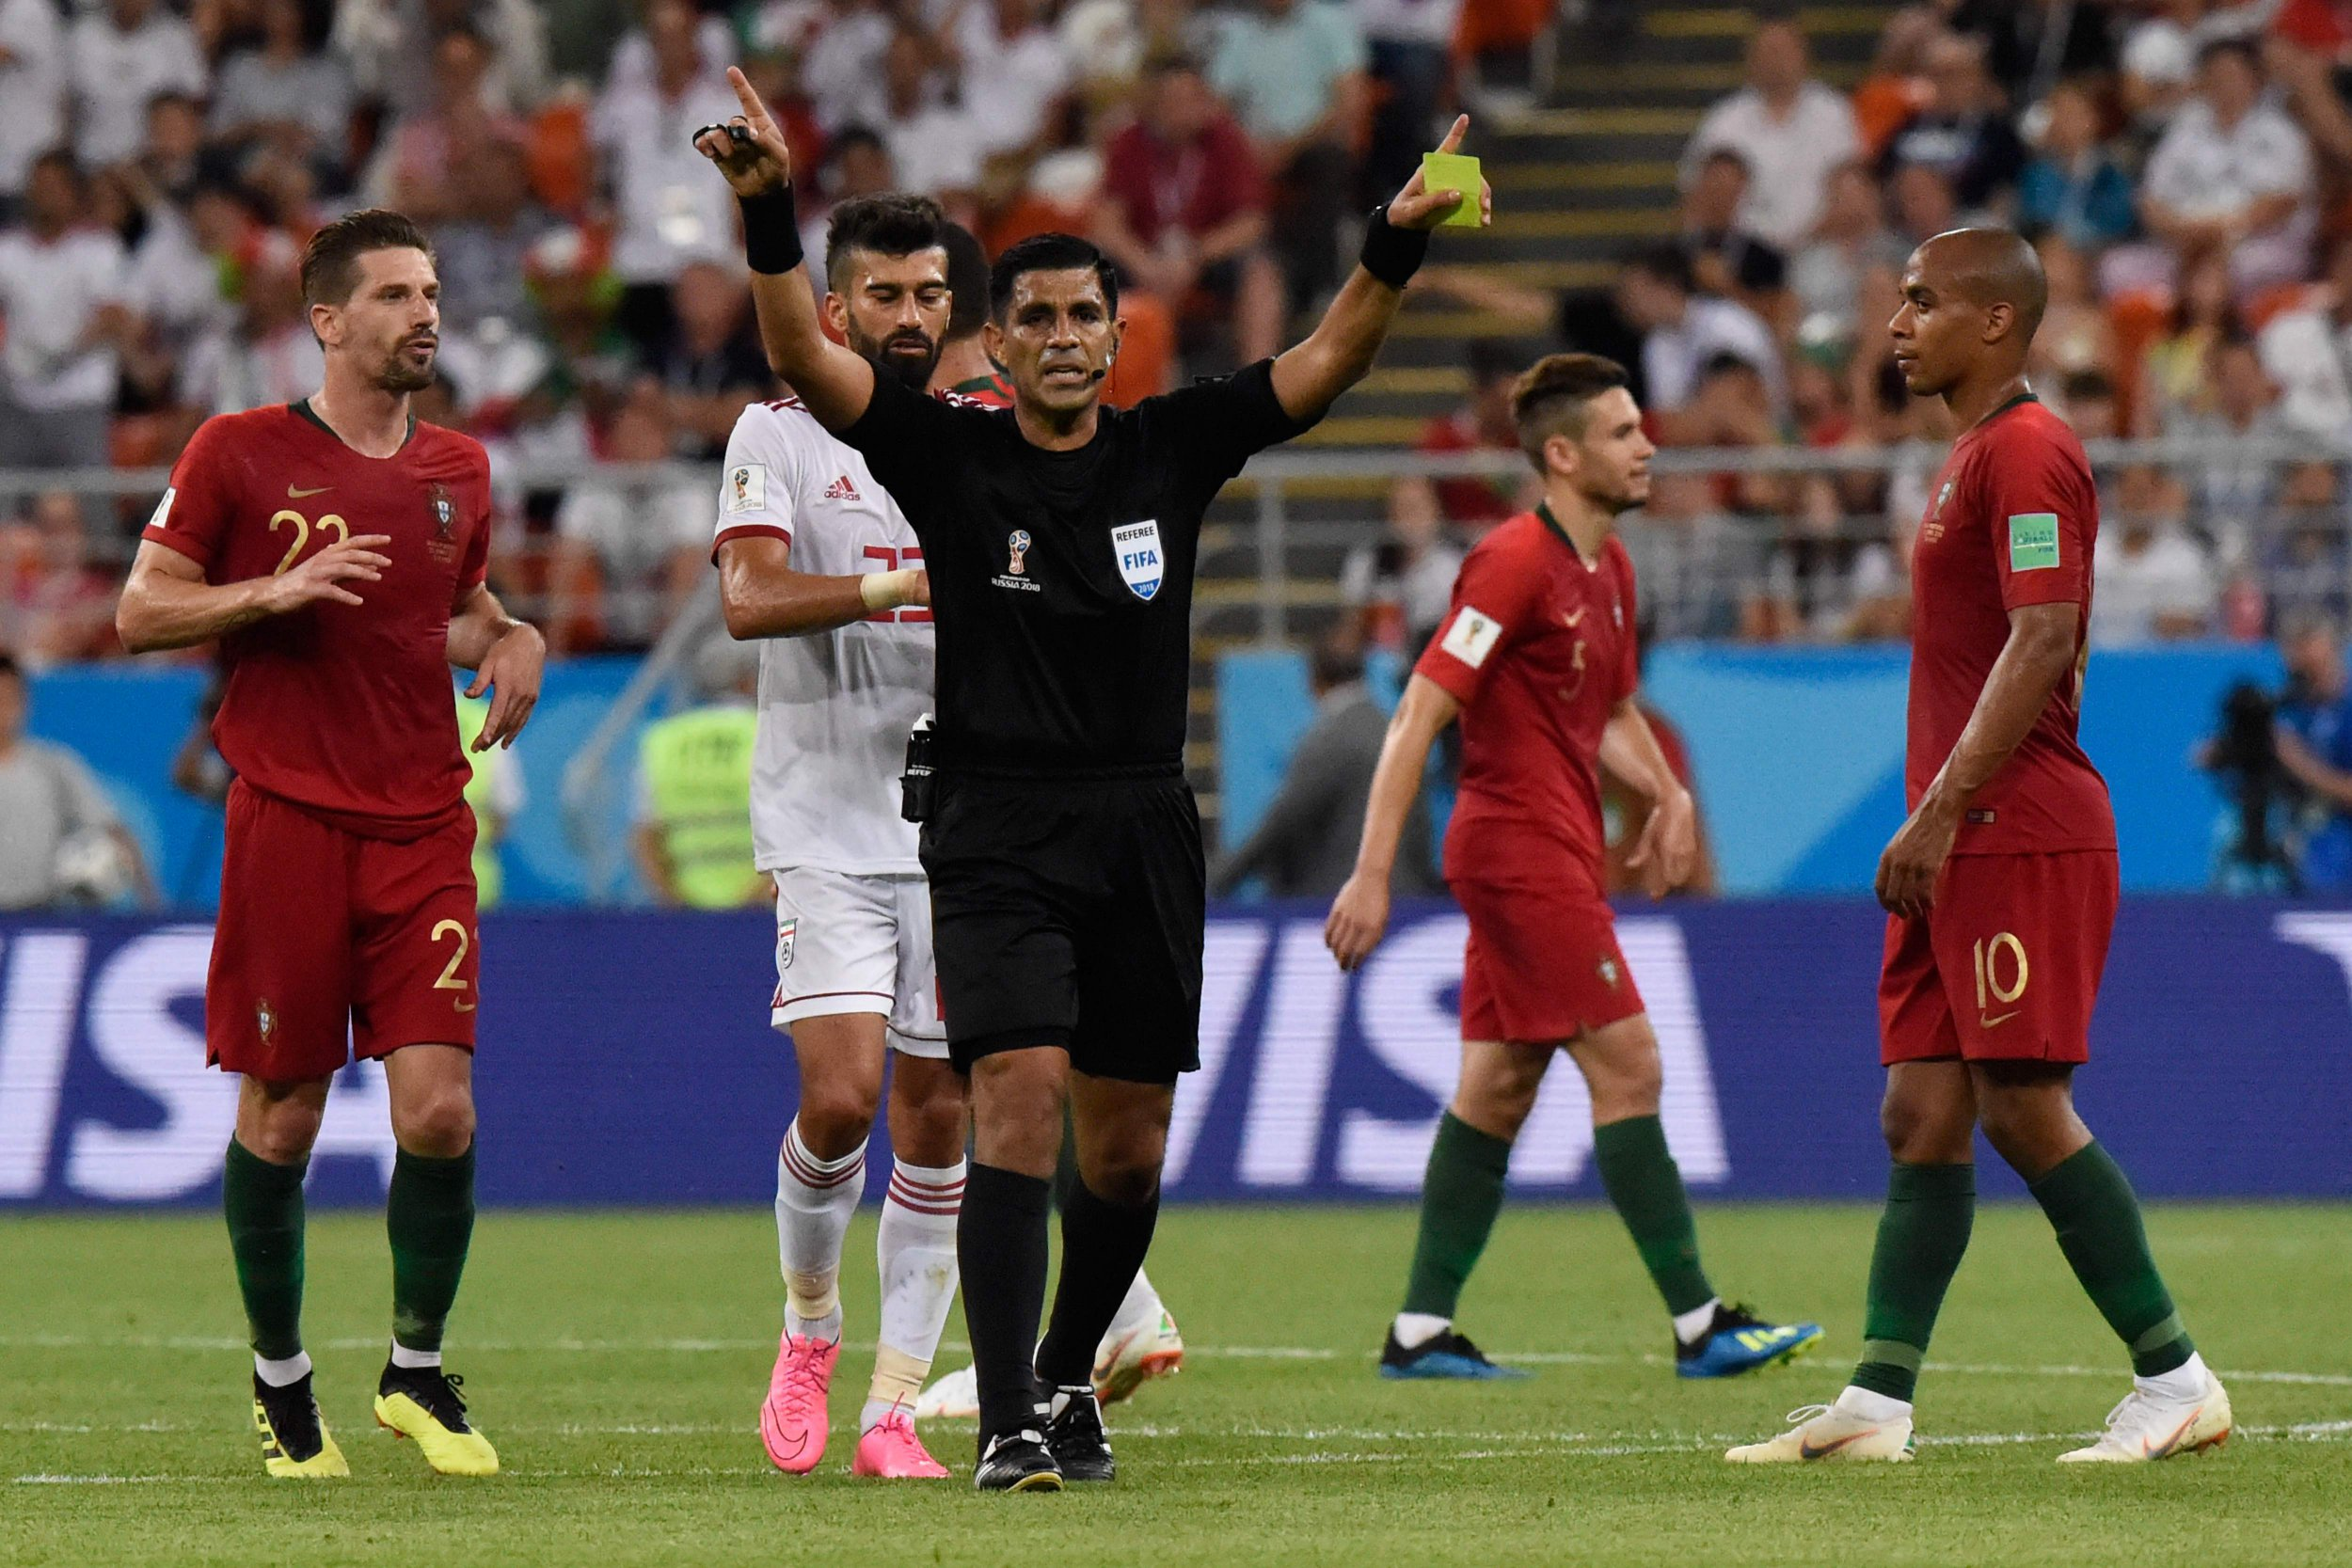 Portugal qualify ahead of Iran in VAR drama as Iago Aspas seals top spot for Spain